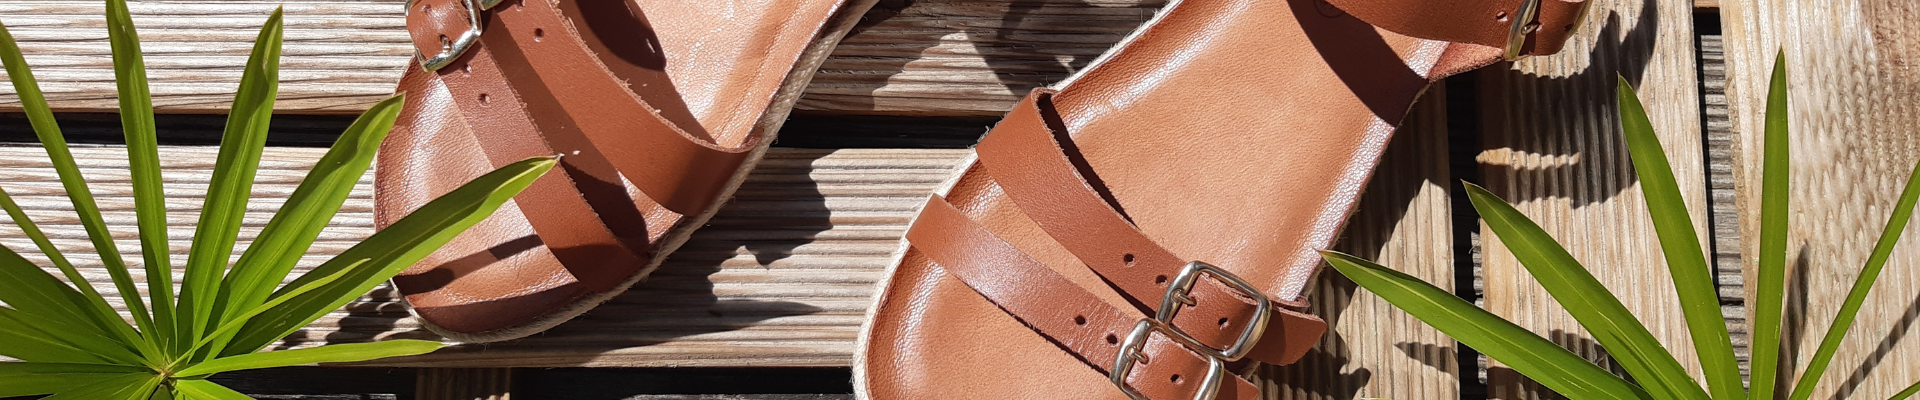 Chaussures Estivales PharmaConfort en Pharmacie